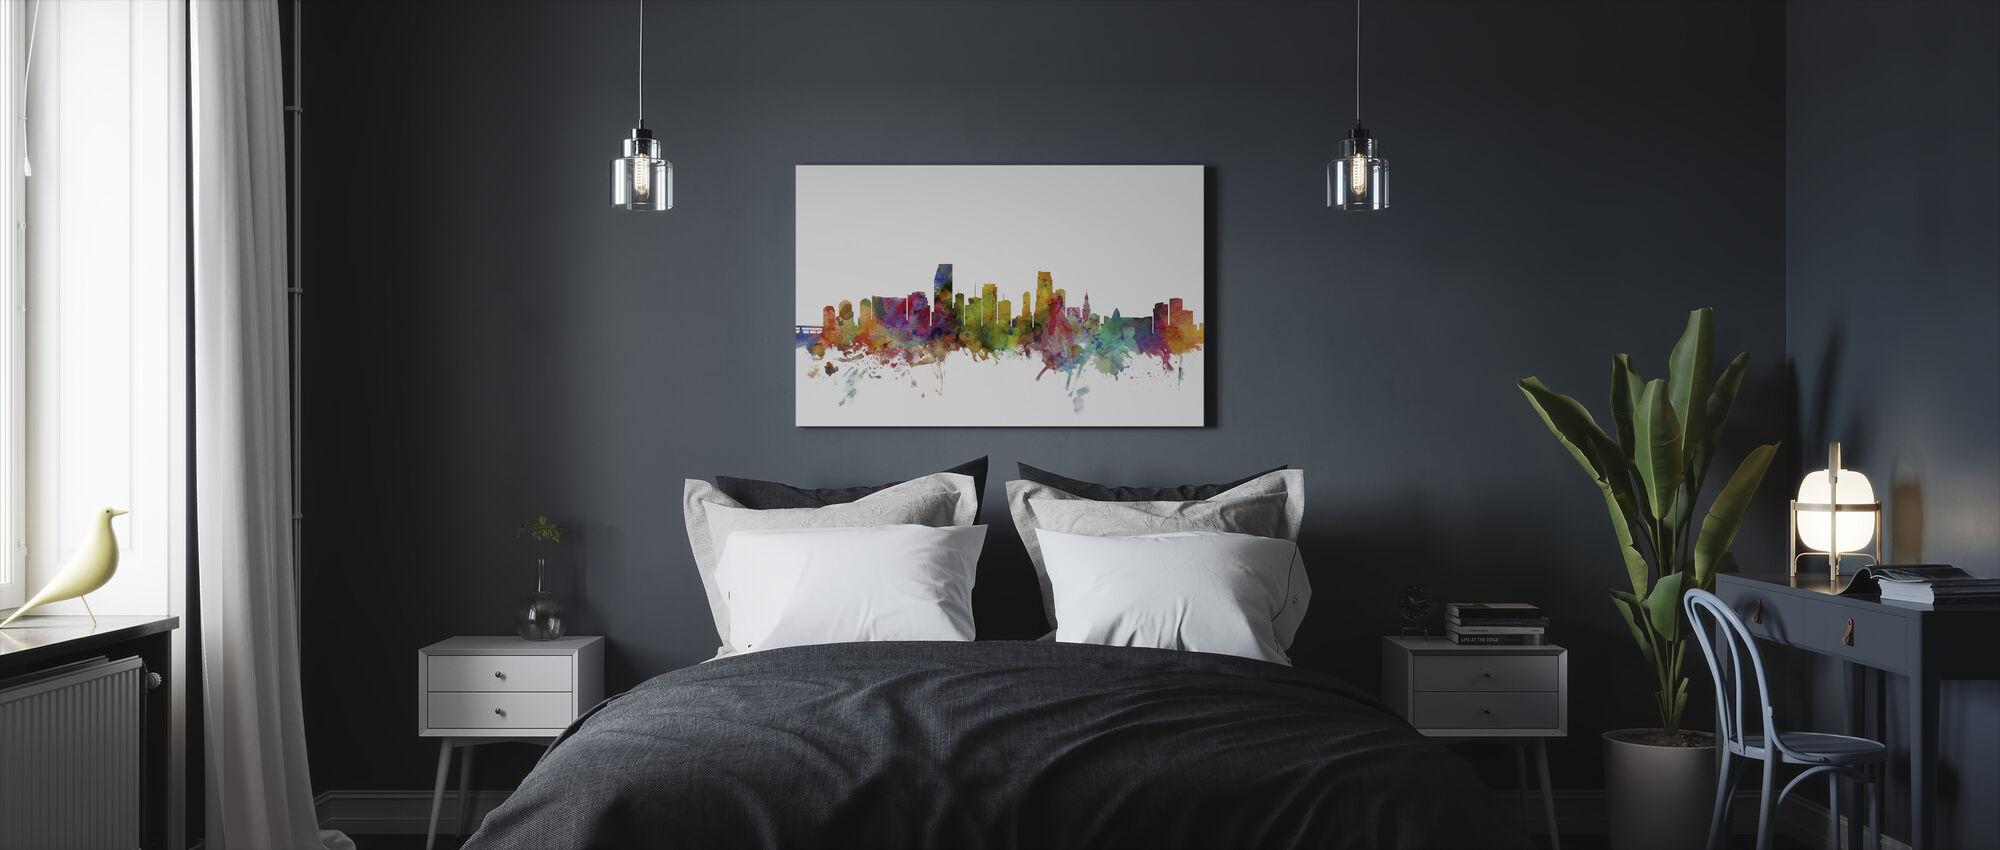 Miami Florida Skyline - Canvas print - Bedroom